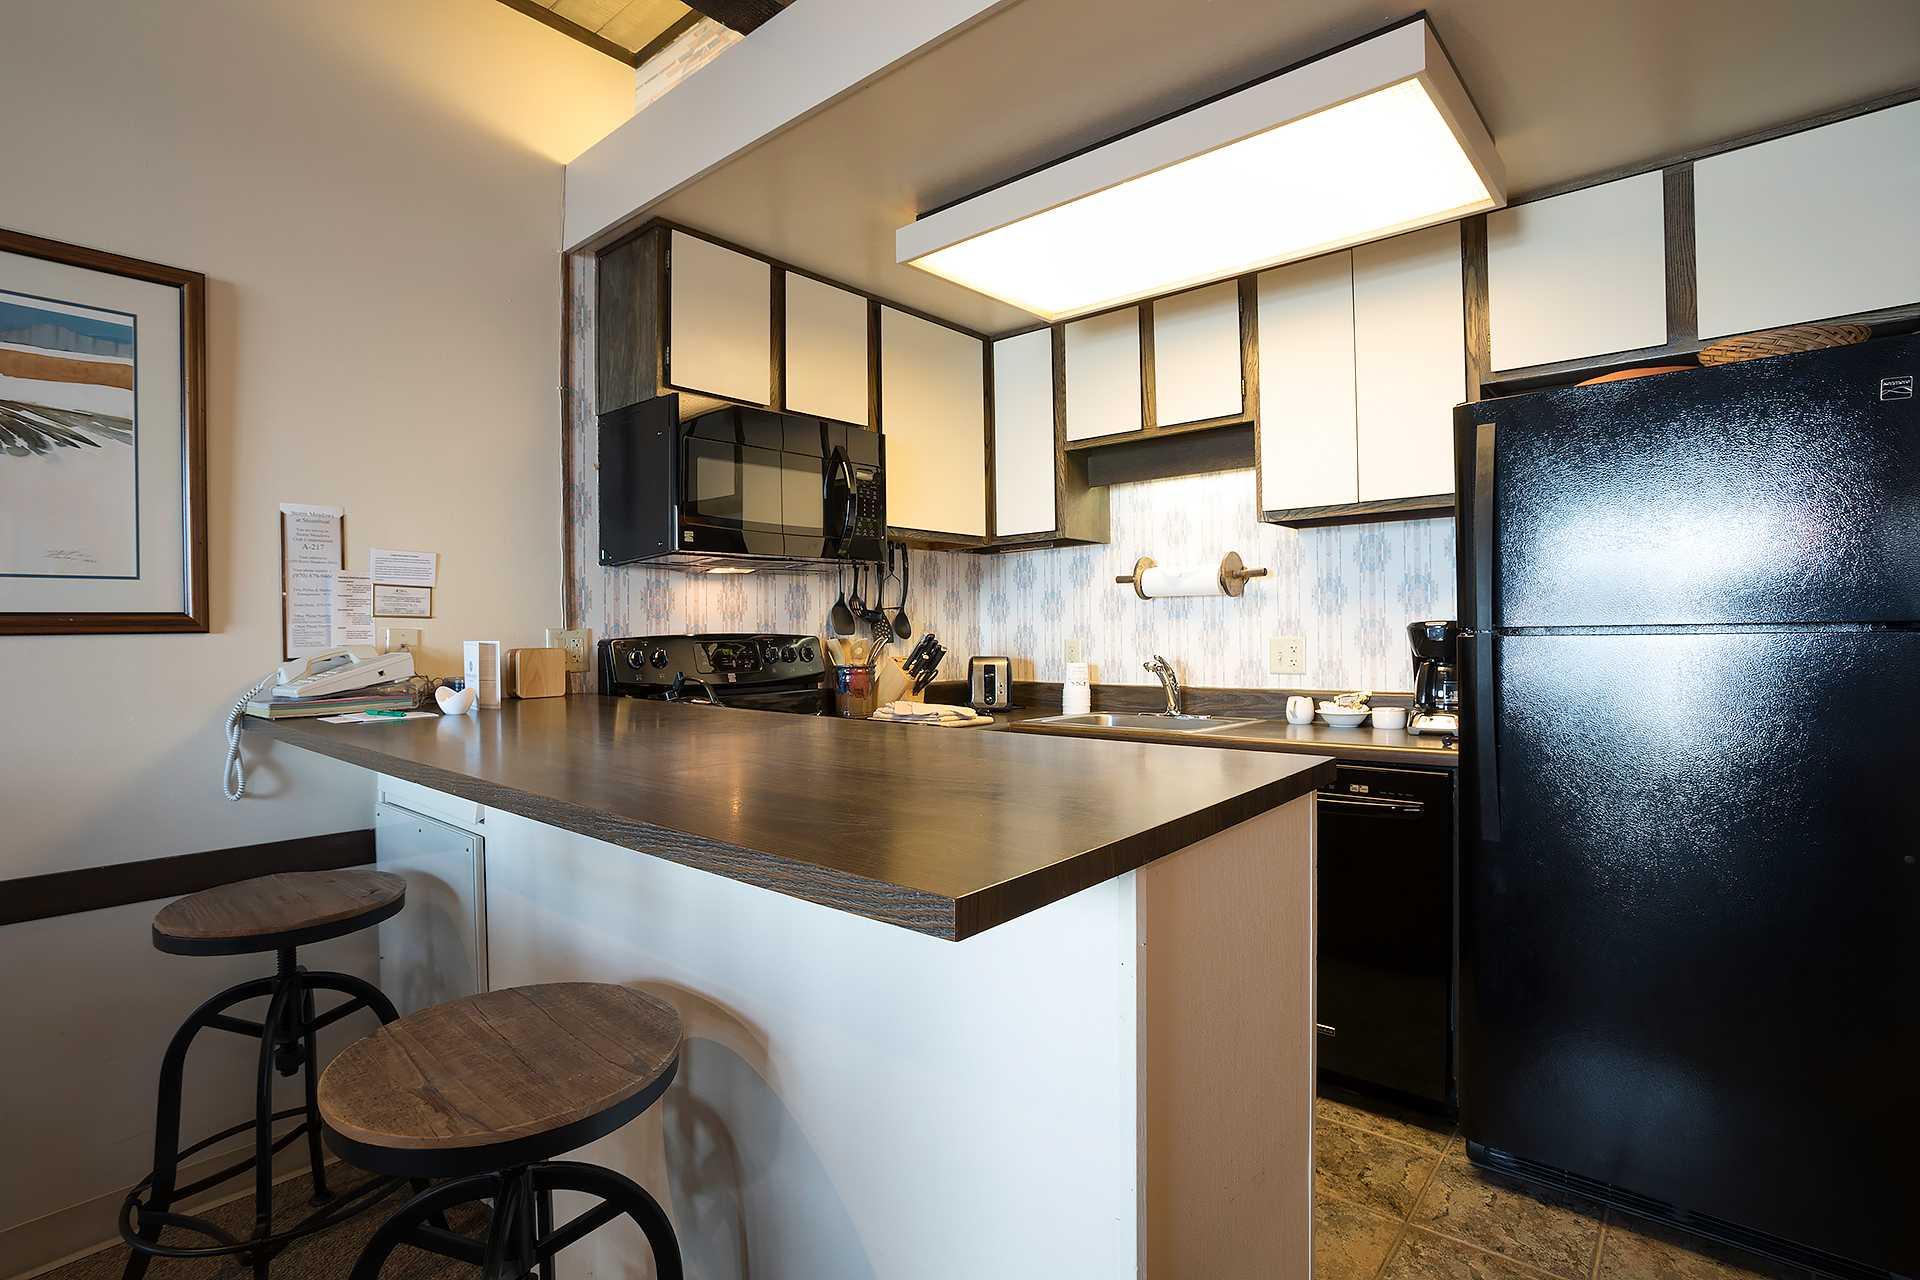 CA217: Storm Meadows Club A Condominiums